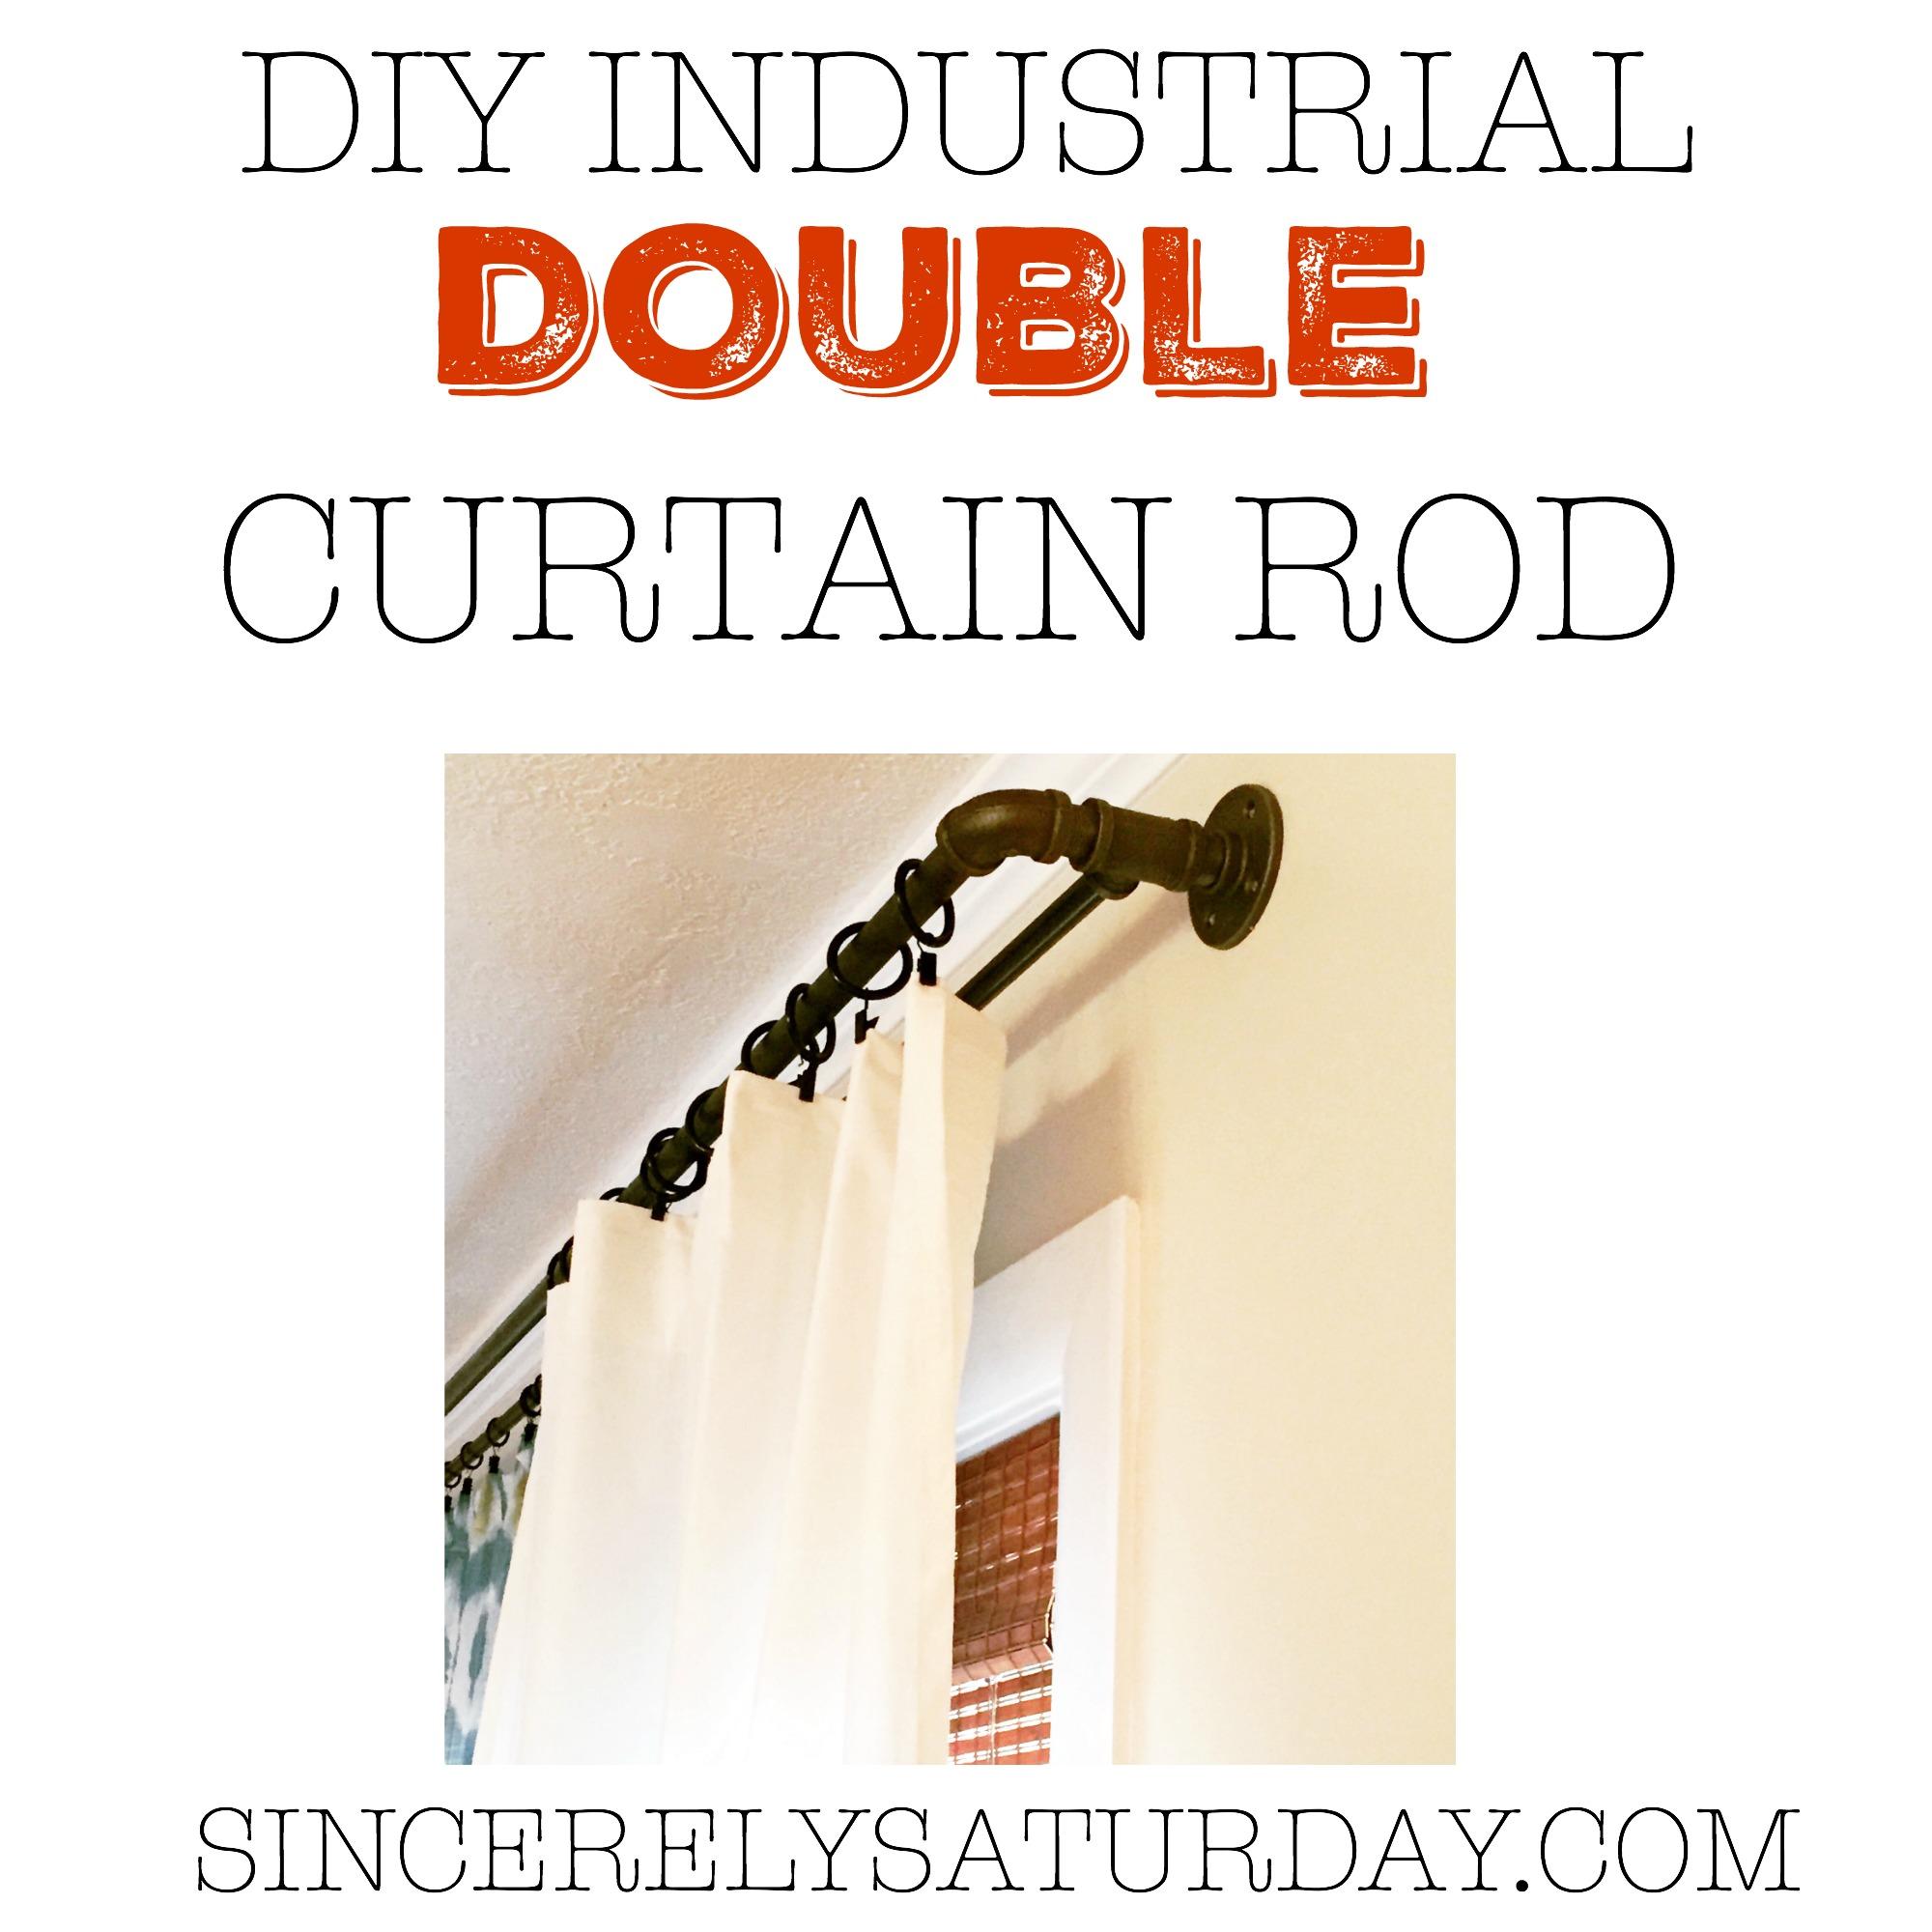 diy industrial double conduit curtain